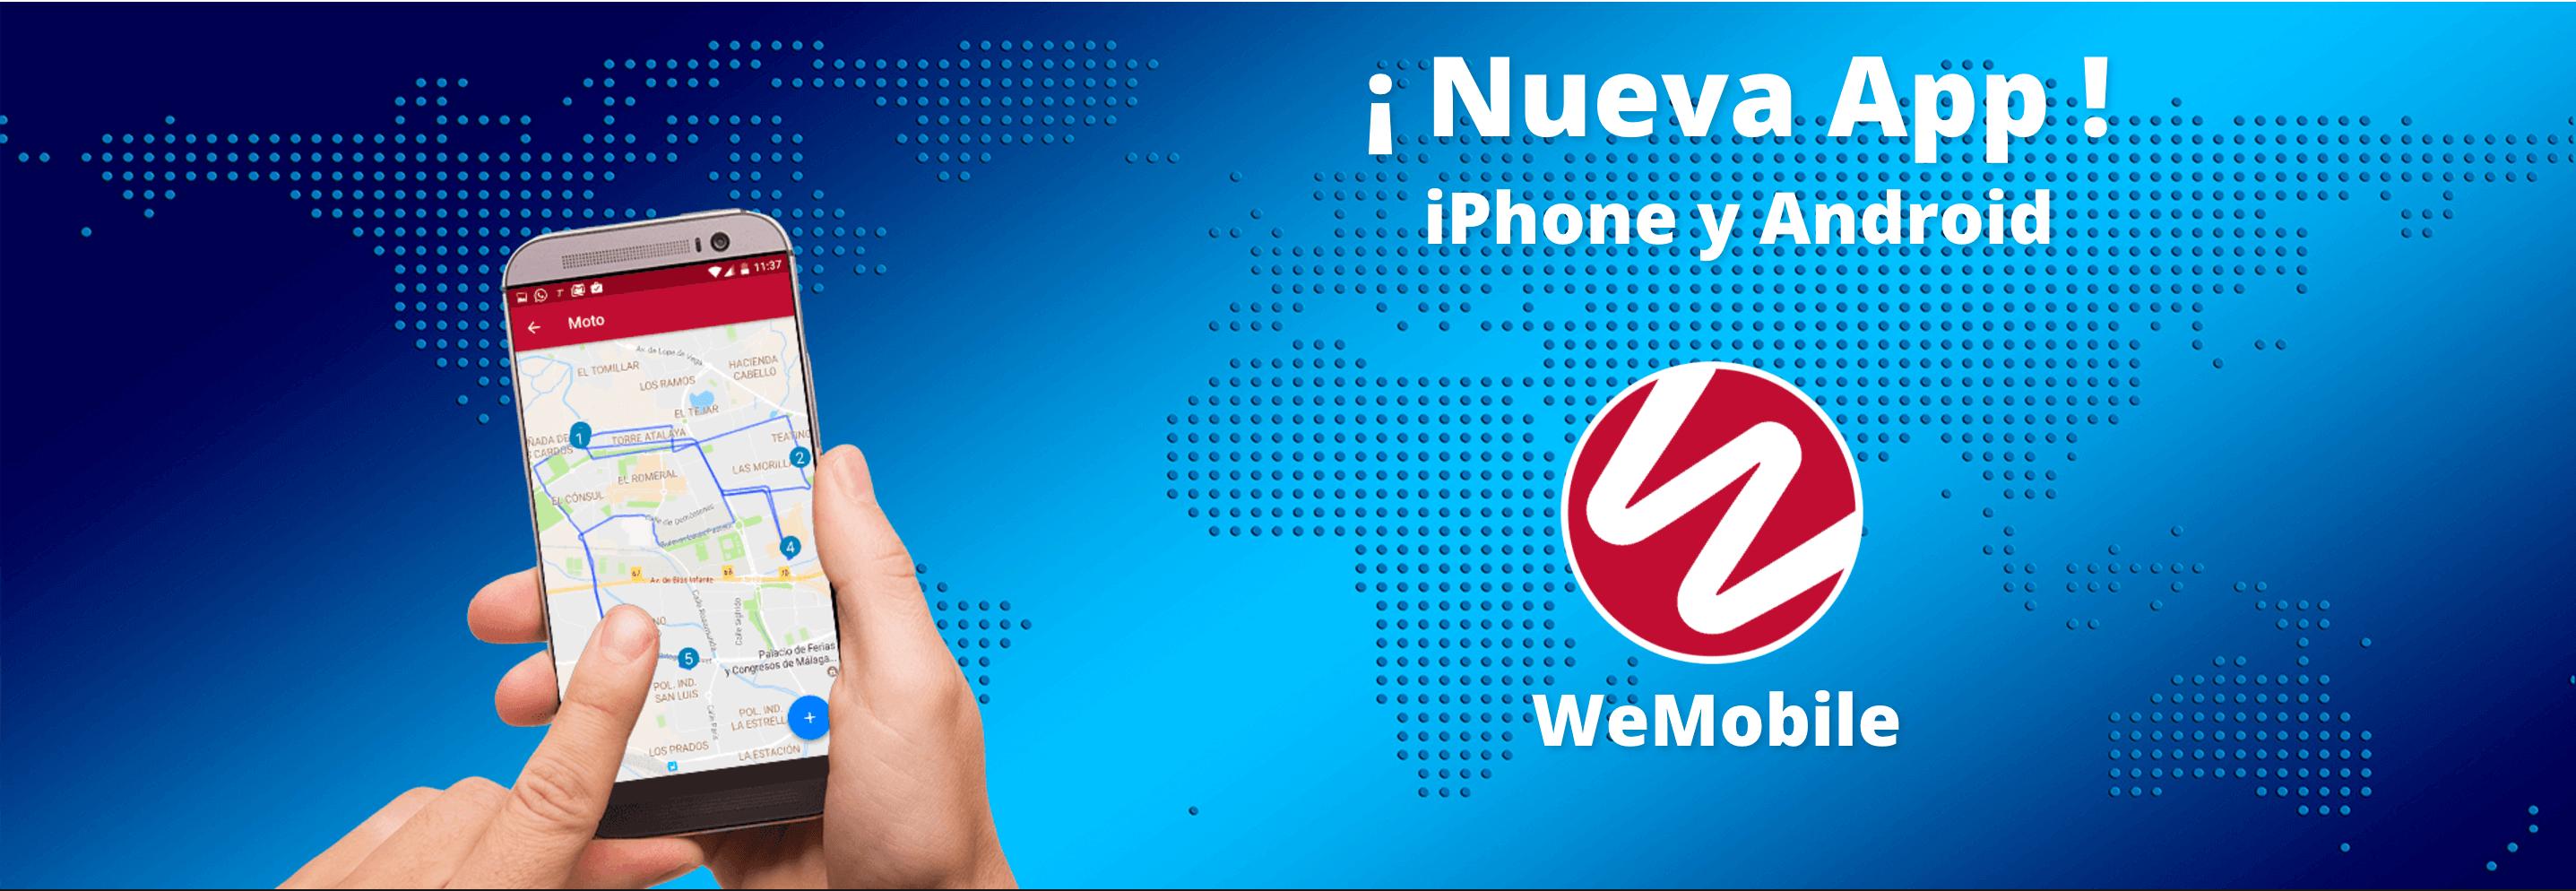 WeMobile app